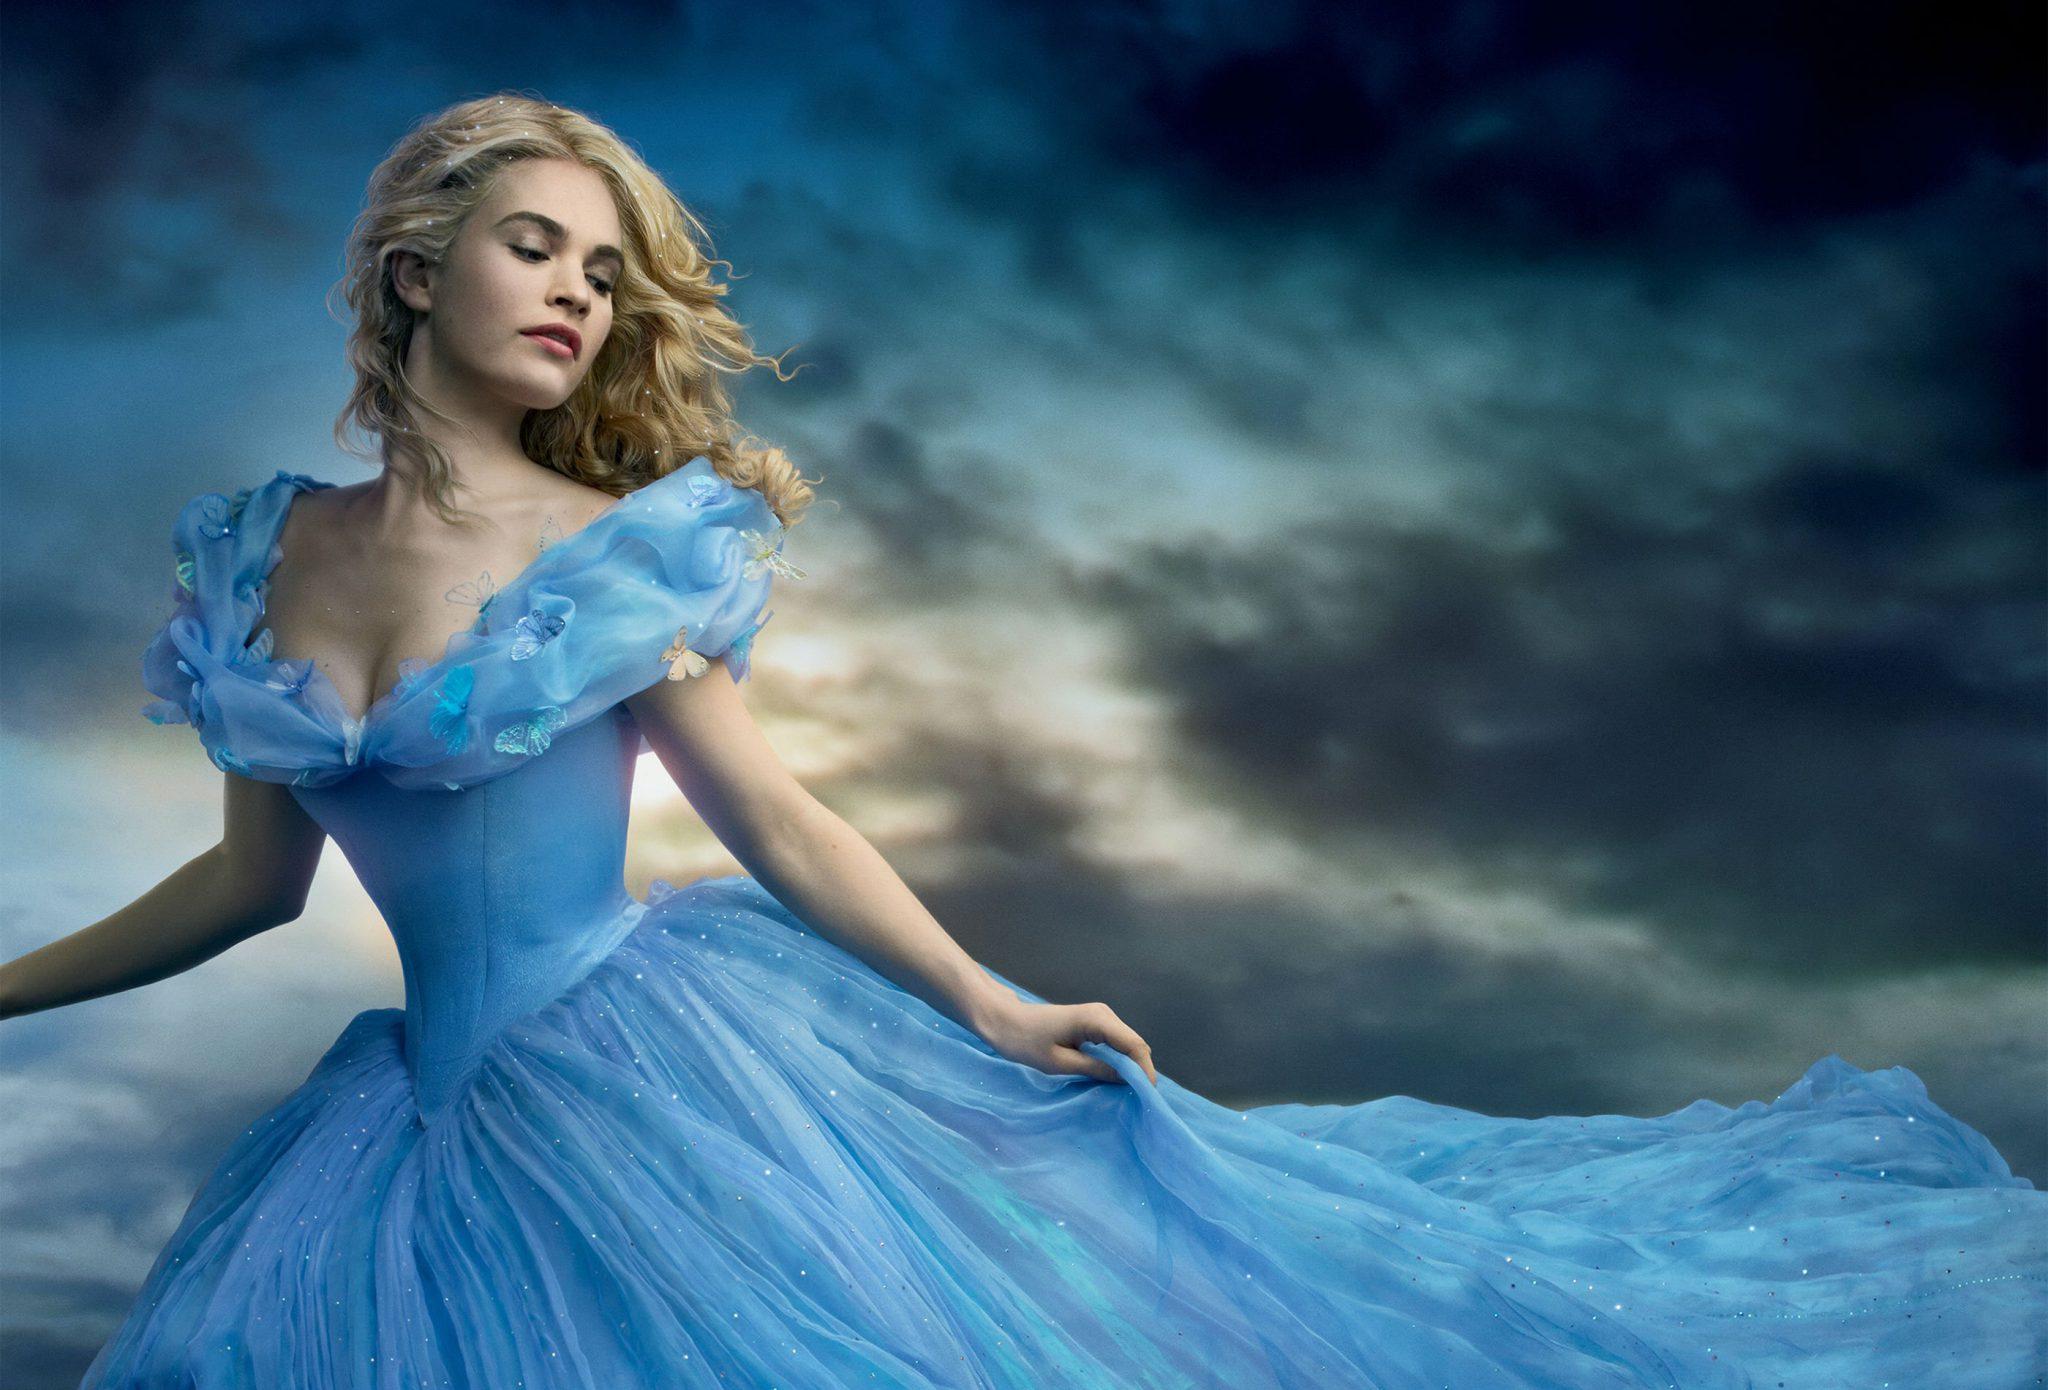 Dress up for Disneys Cinderella screening in Ballymena